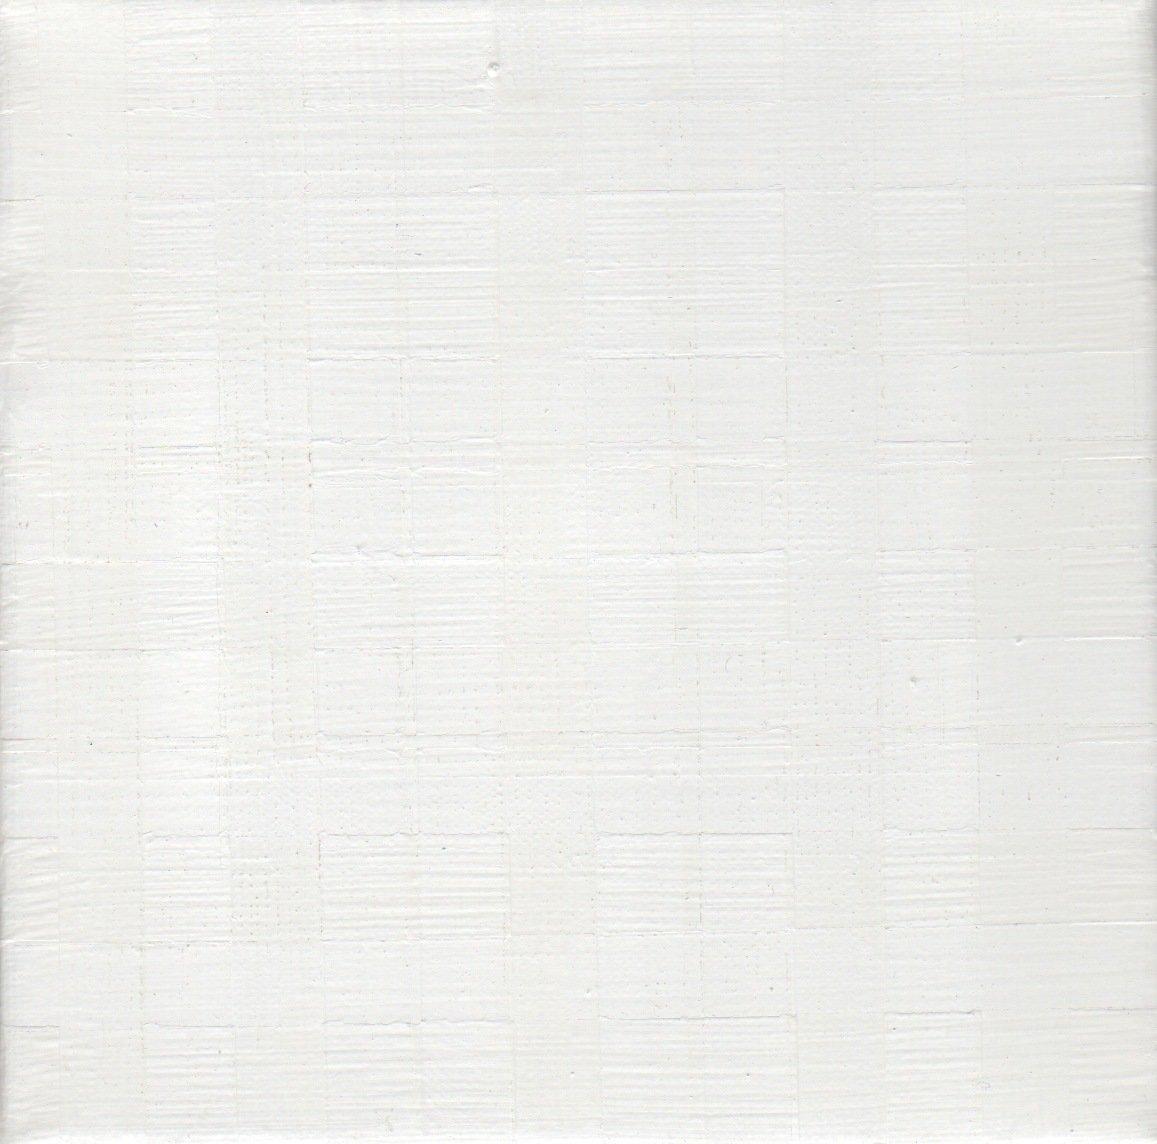 Polyphon/weiß/Polyphon/white 03 53_Polyphon/weiß/Polyphon/white 03